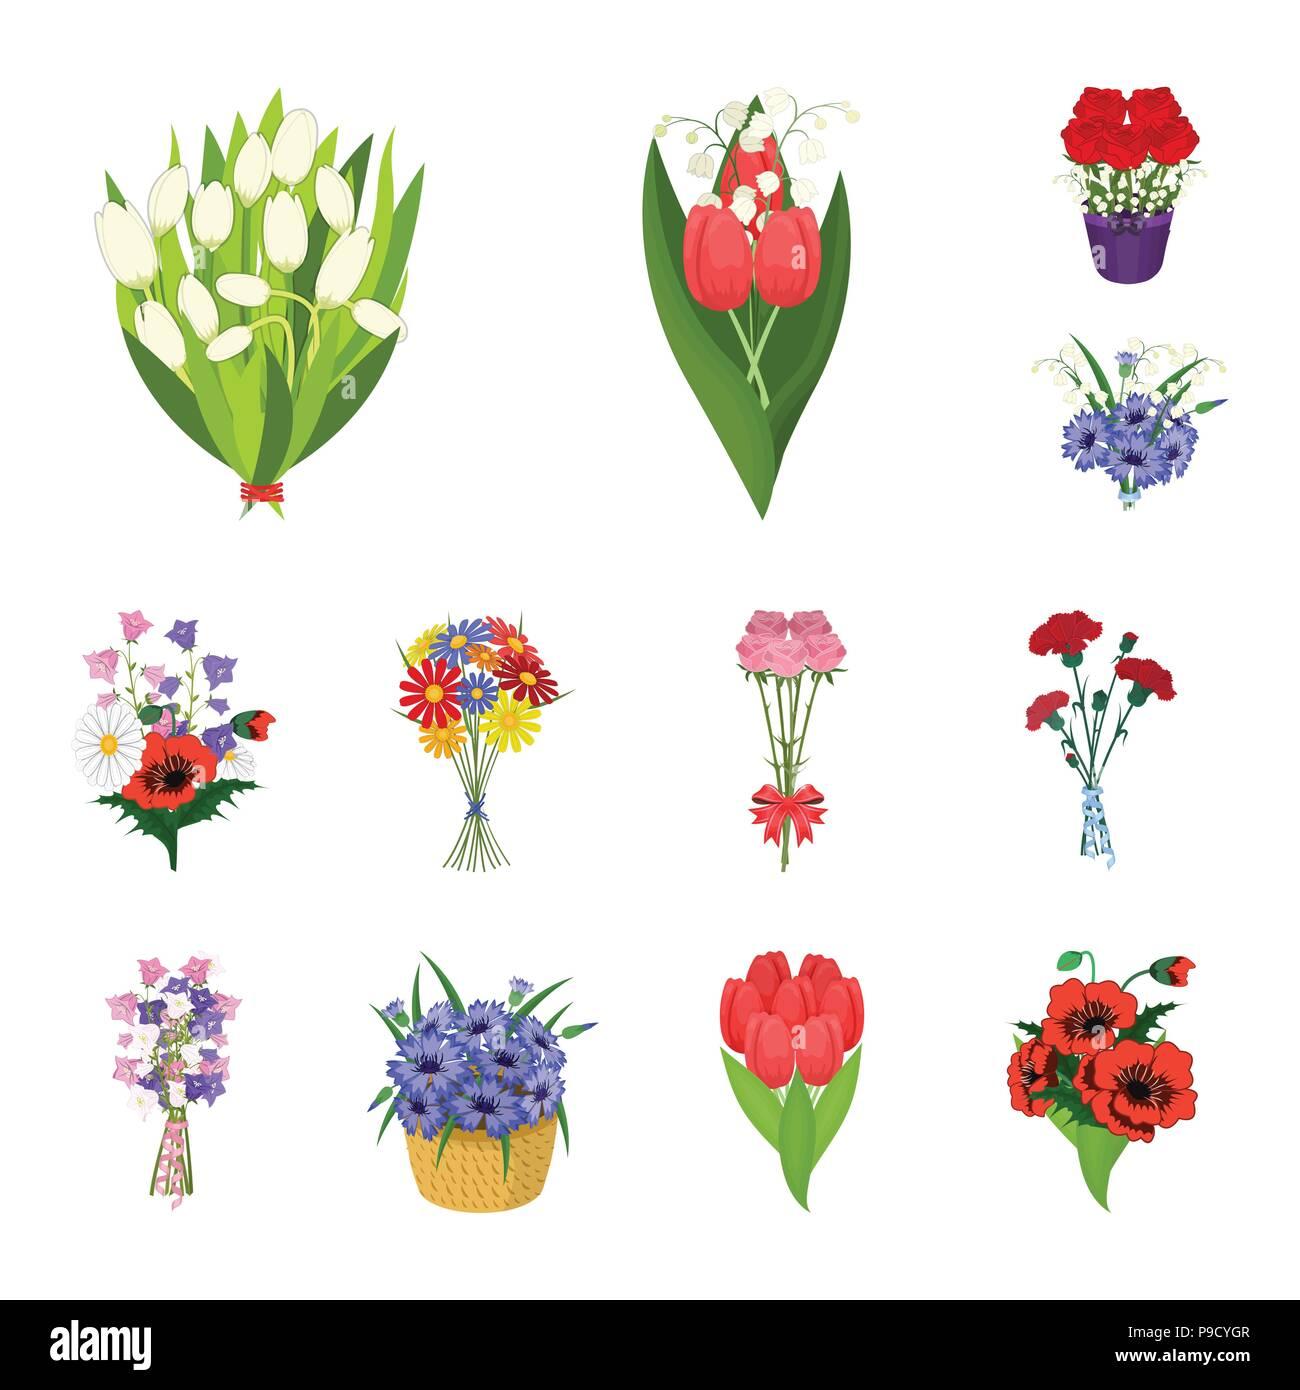 Cartoon Poppy Flower Stock Photos Cartoon Poppy Flower Stock